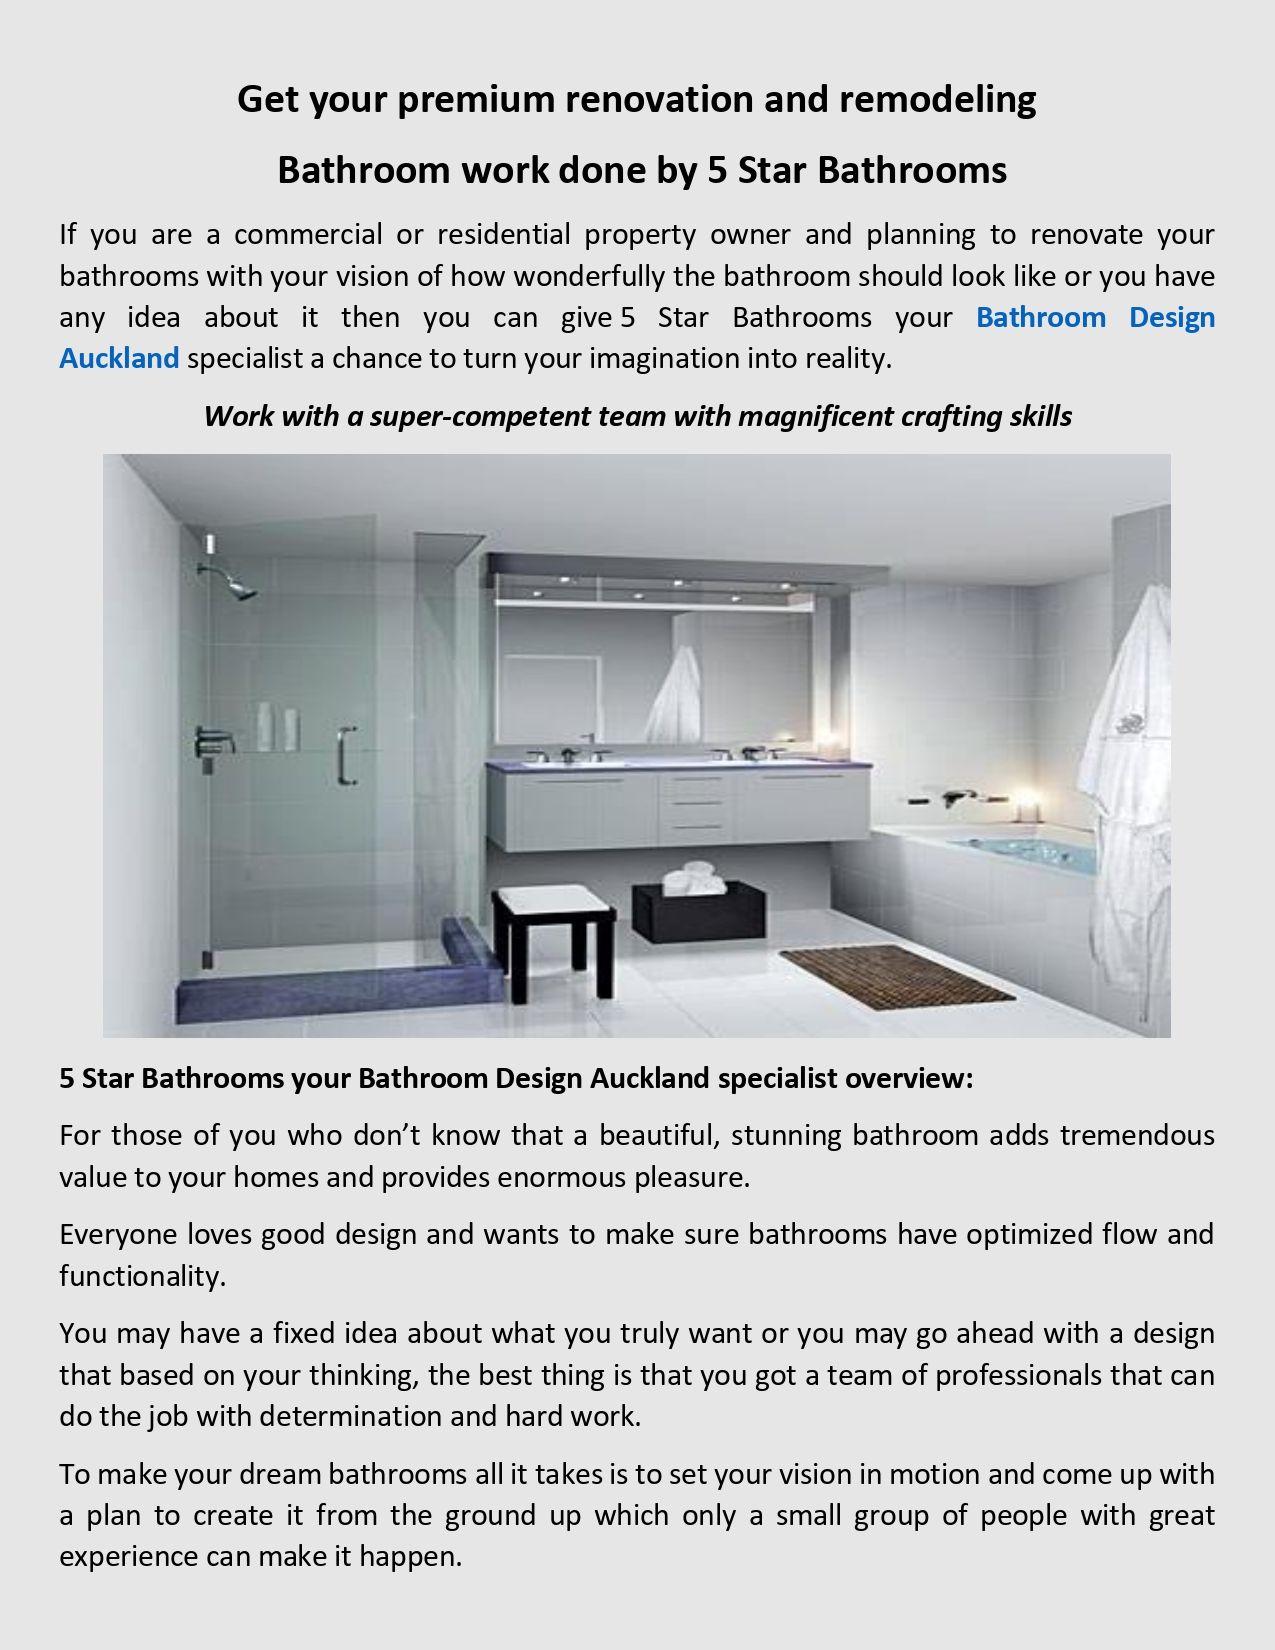 Five Star Bathroom Design Your Home Bathroom In 2020 Bathroom Design Bathroom Renovation Cost Design Your Home